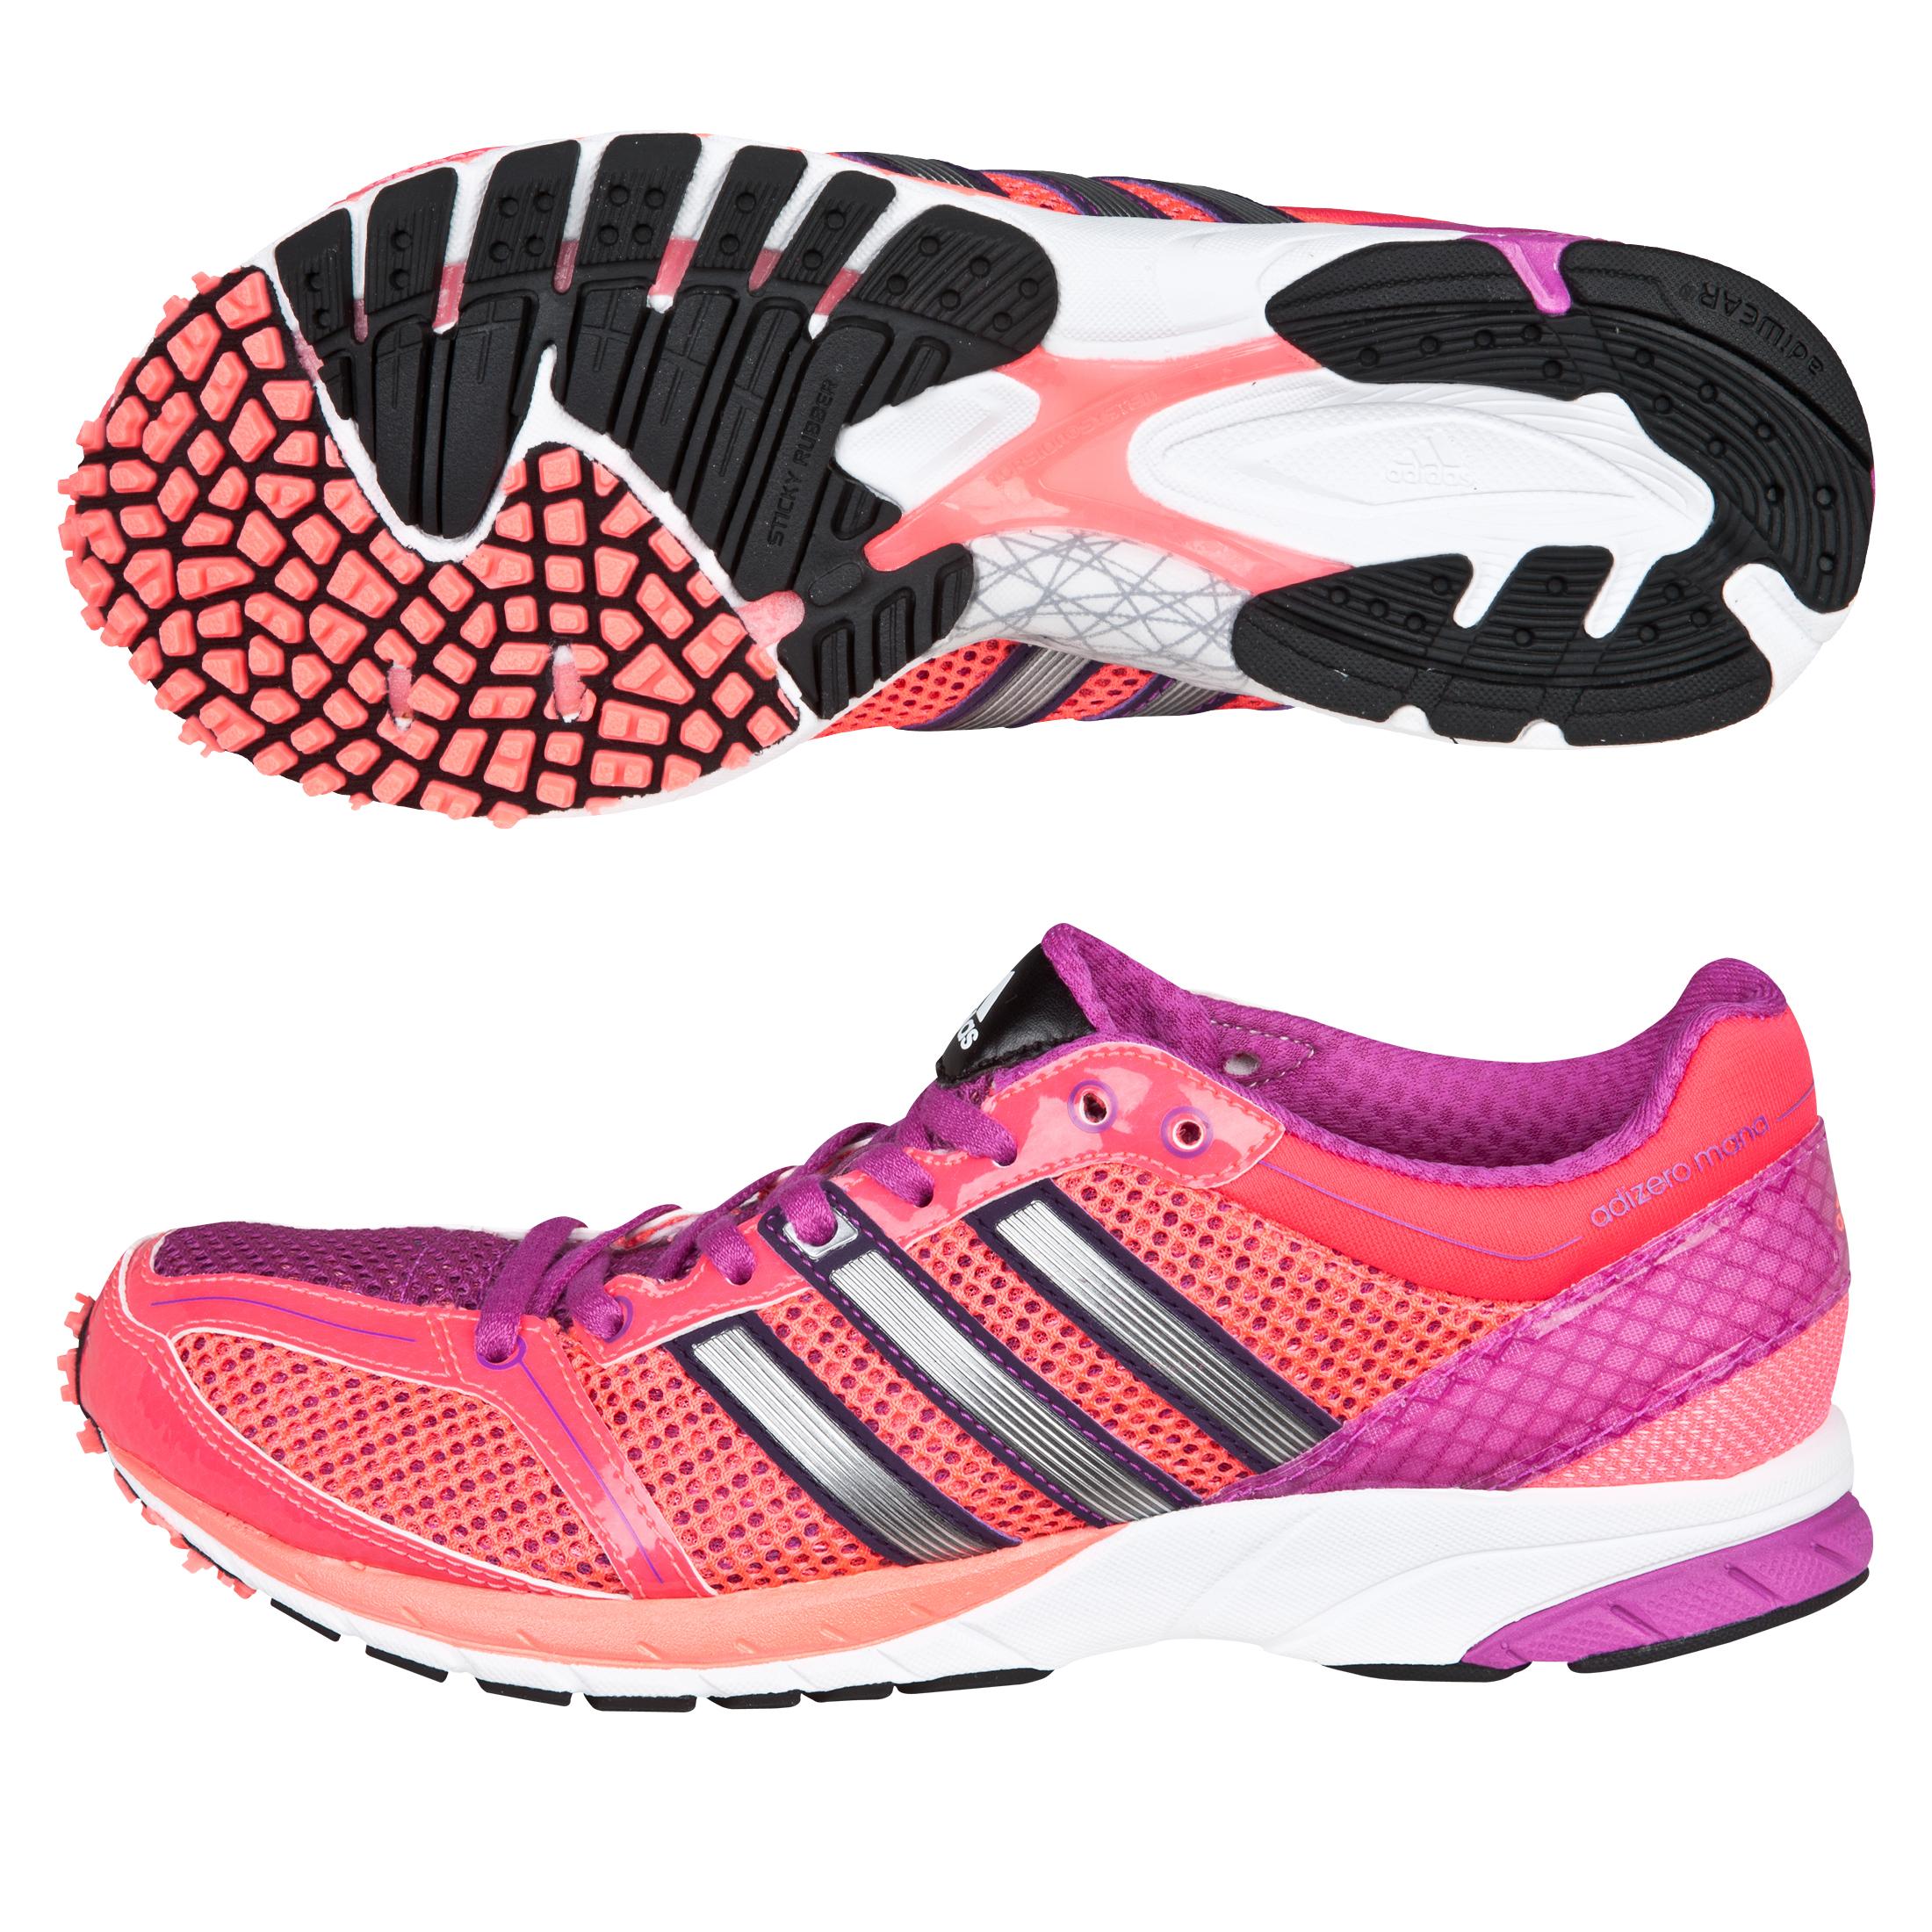 Adidas Adizero Mana 7 Trainer  Womens